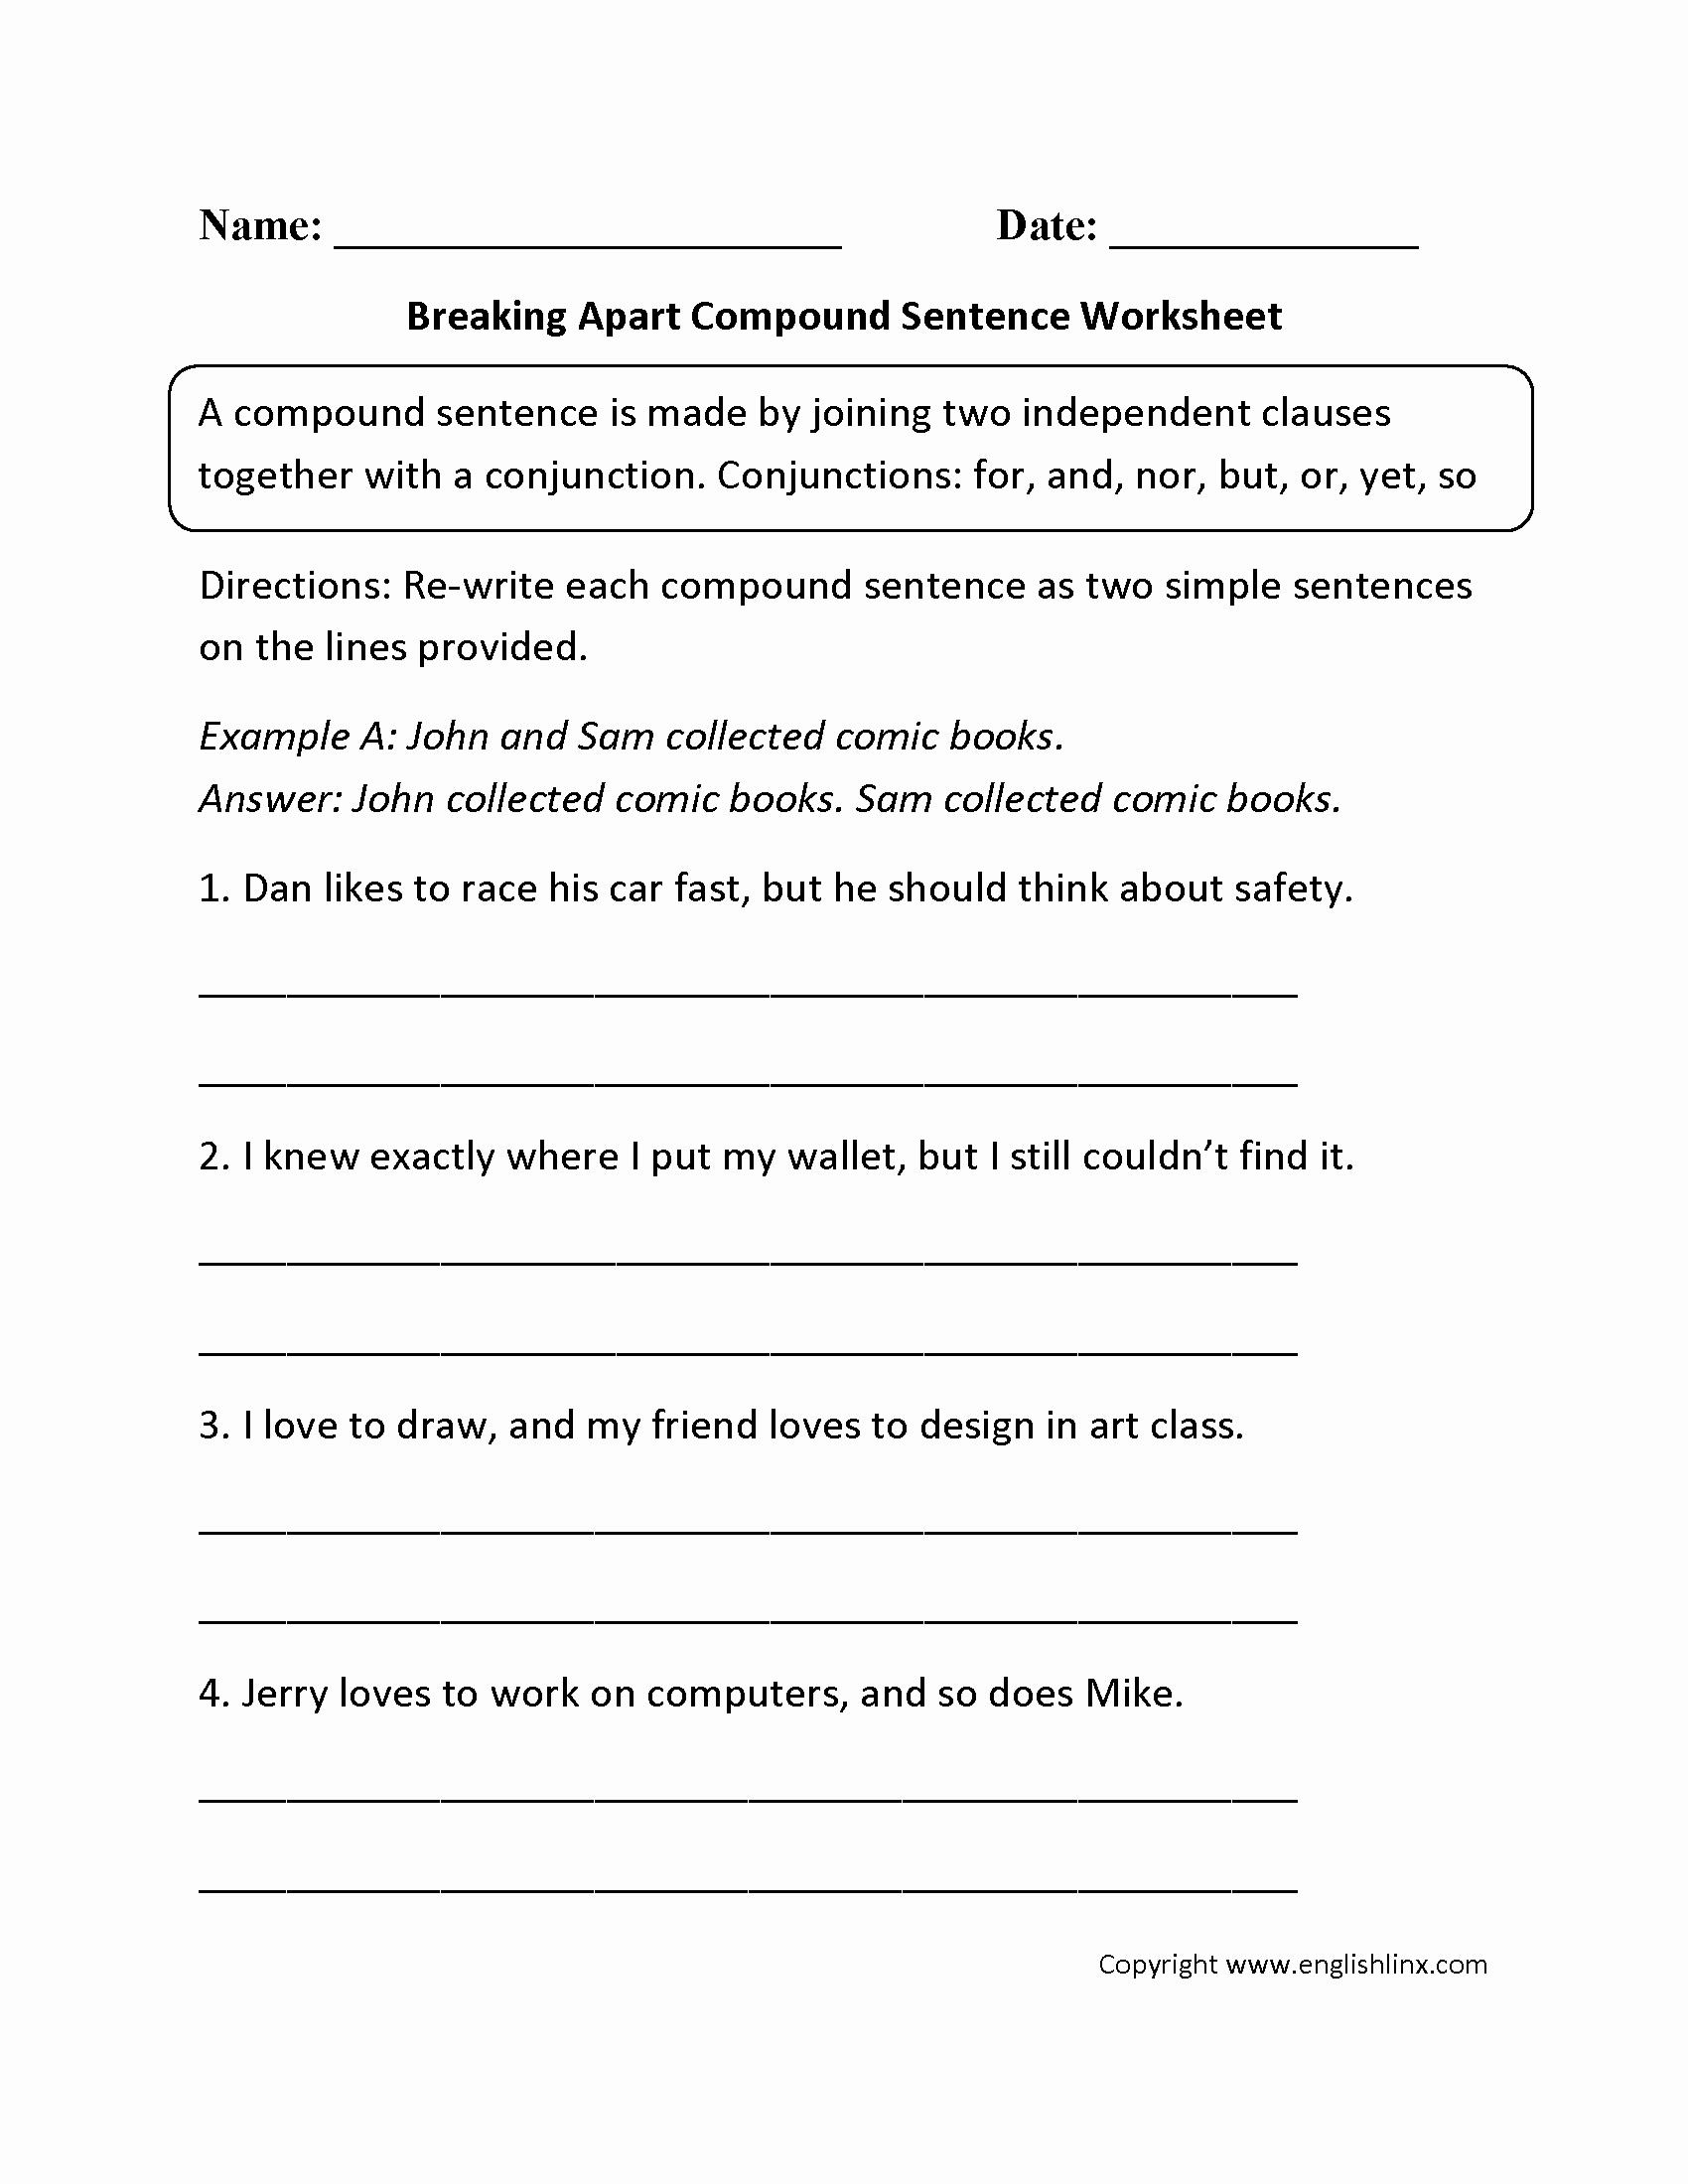 50 Compound Sentences Worksheet